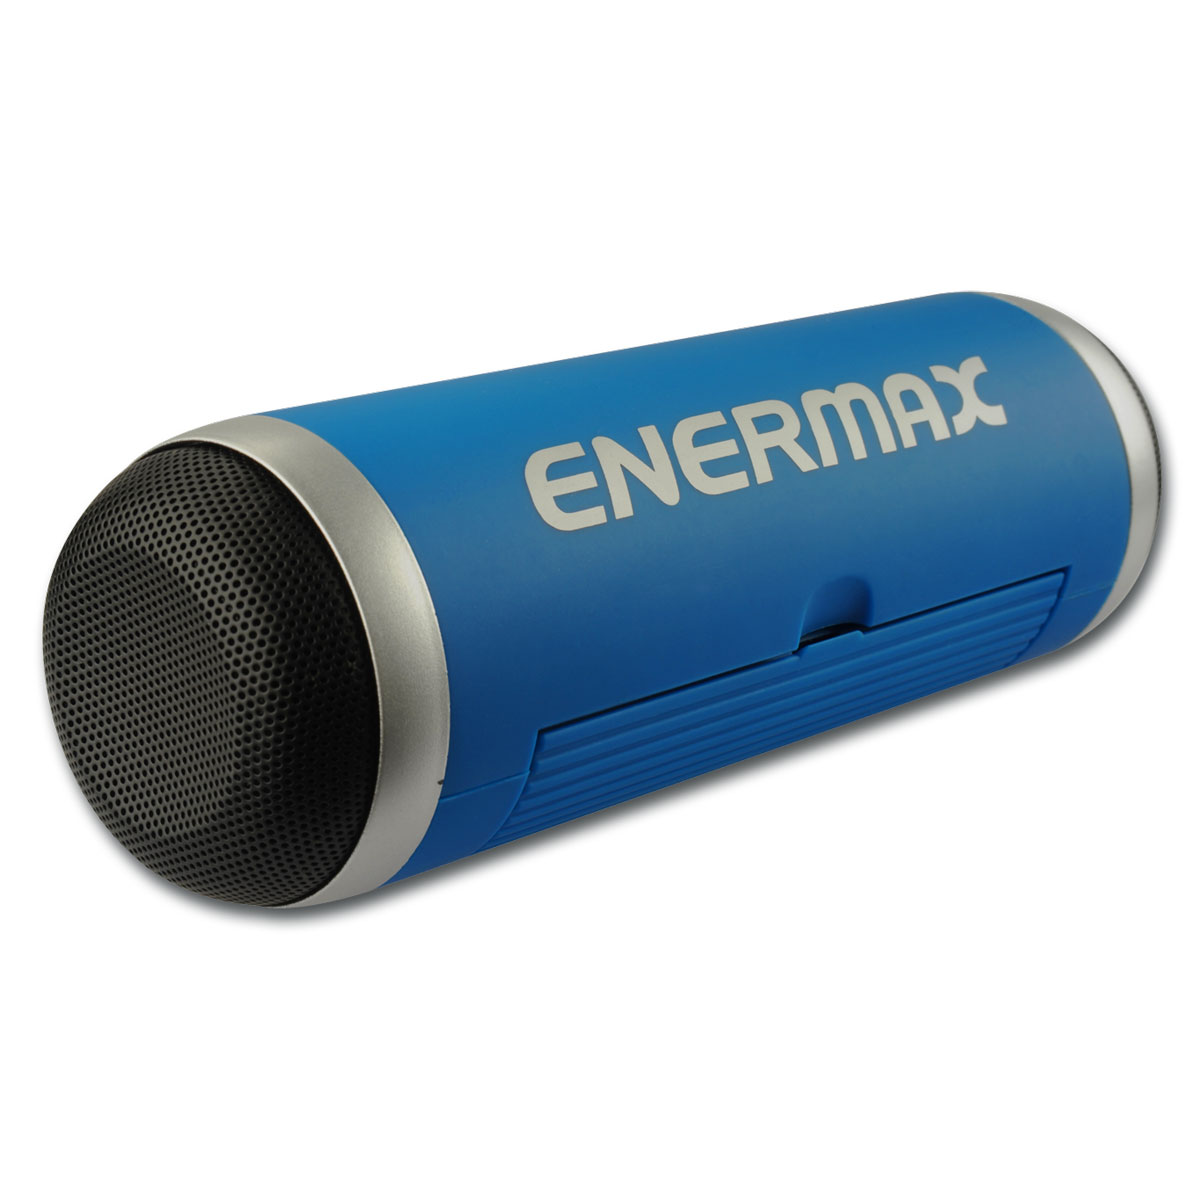 enermax eas01 bleu dock enceinte bluetooth enermax sur. Black Bedroom Furniture Sets. Home Design Ideas